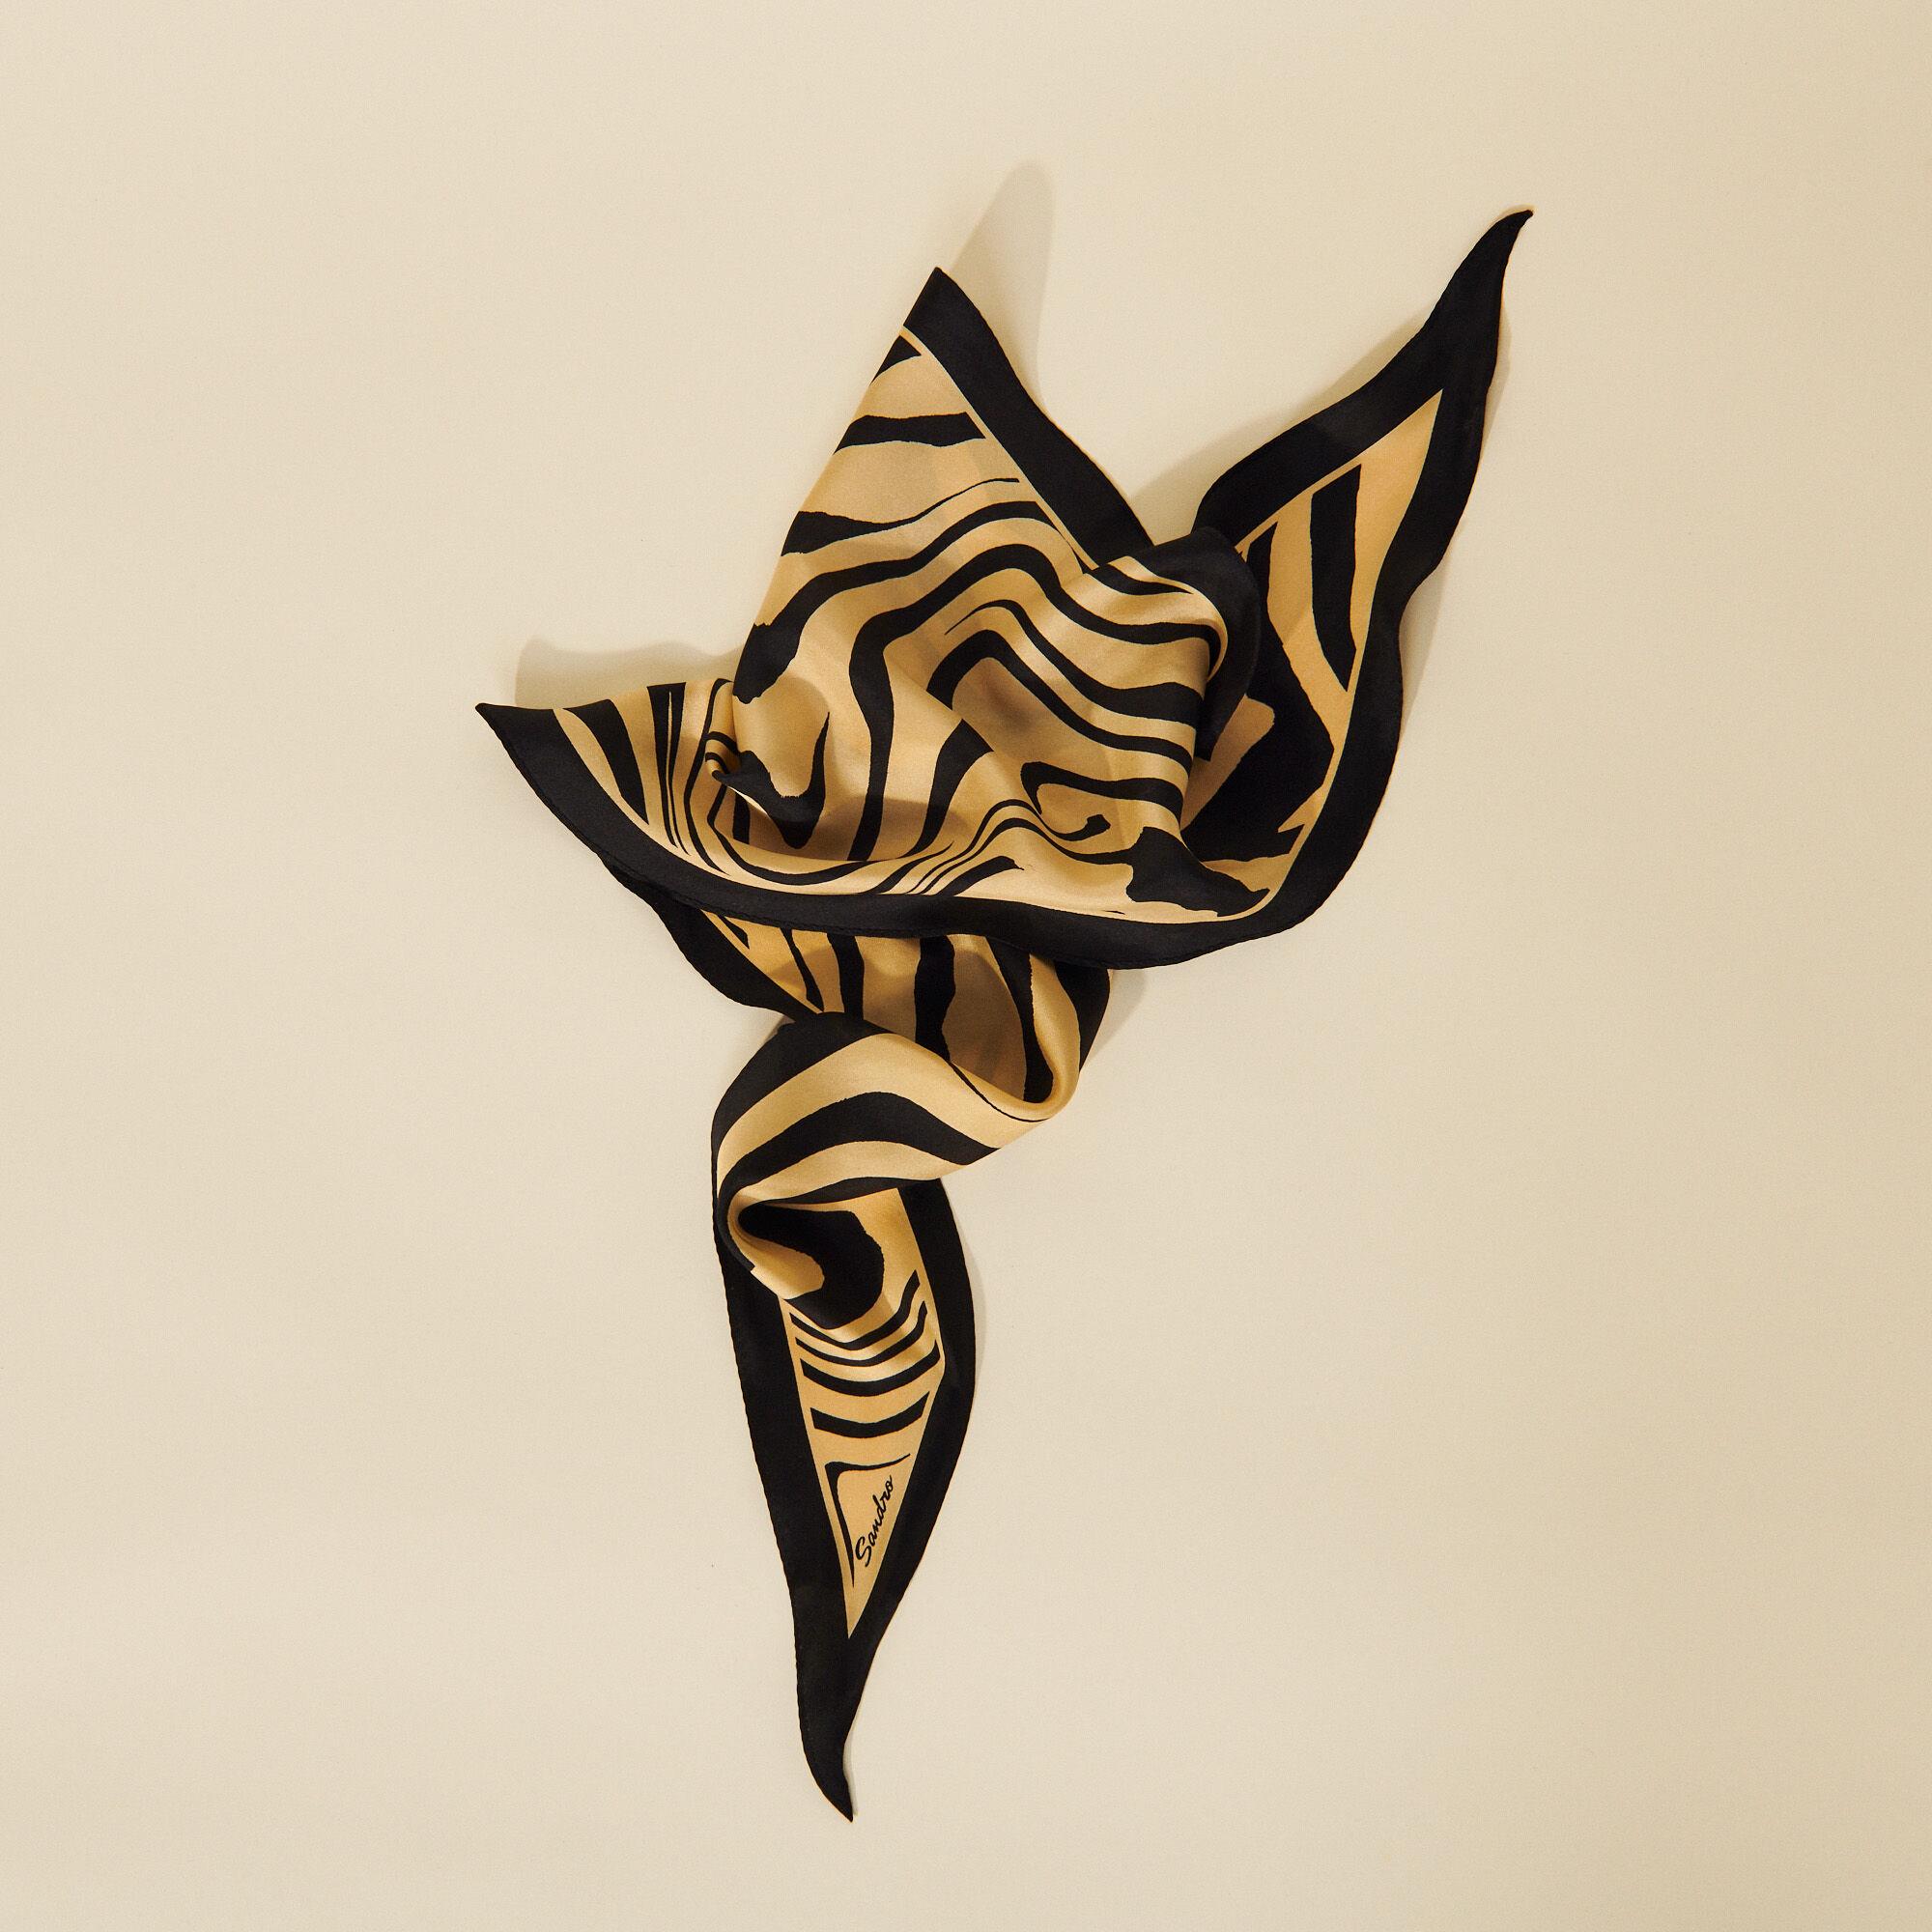 Printed silk scarf, diamond shape - Sandro - Modalova